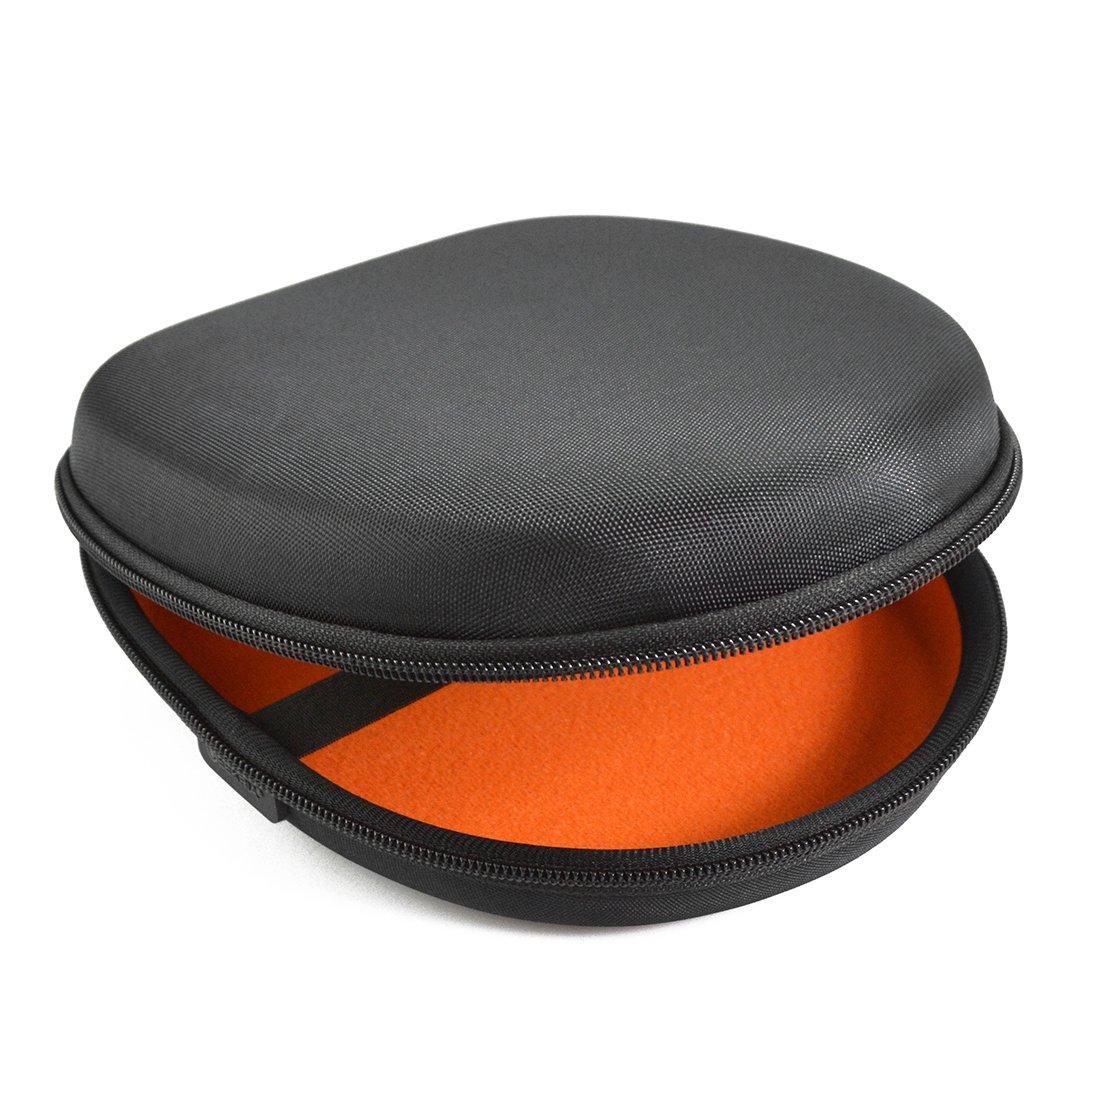 Geekria Headset Case for VXi BlueParrott B450-XT, B350-XT, B250-XT, B250-XTS, Voiinoiu, Arkey burds, Mpow Pro, Truck Driver, Call Center Headphone/Hard Shell Carrying Case/Protective Travel Bag